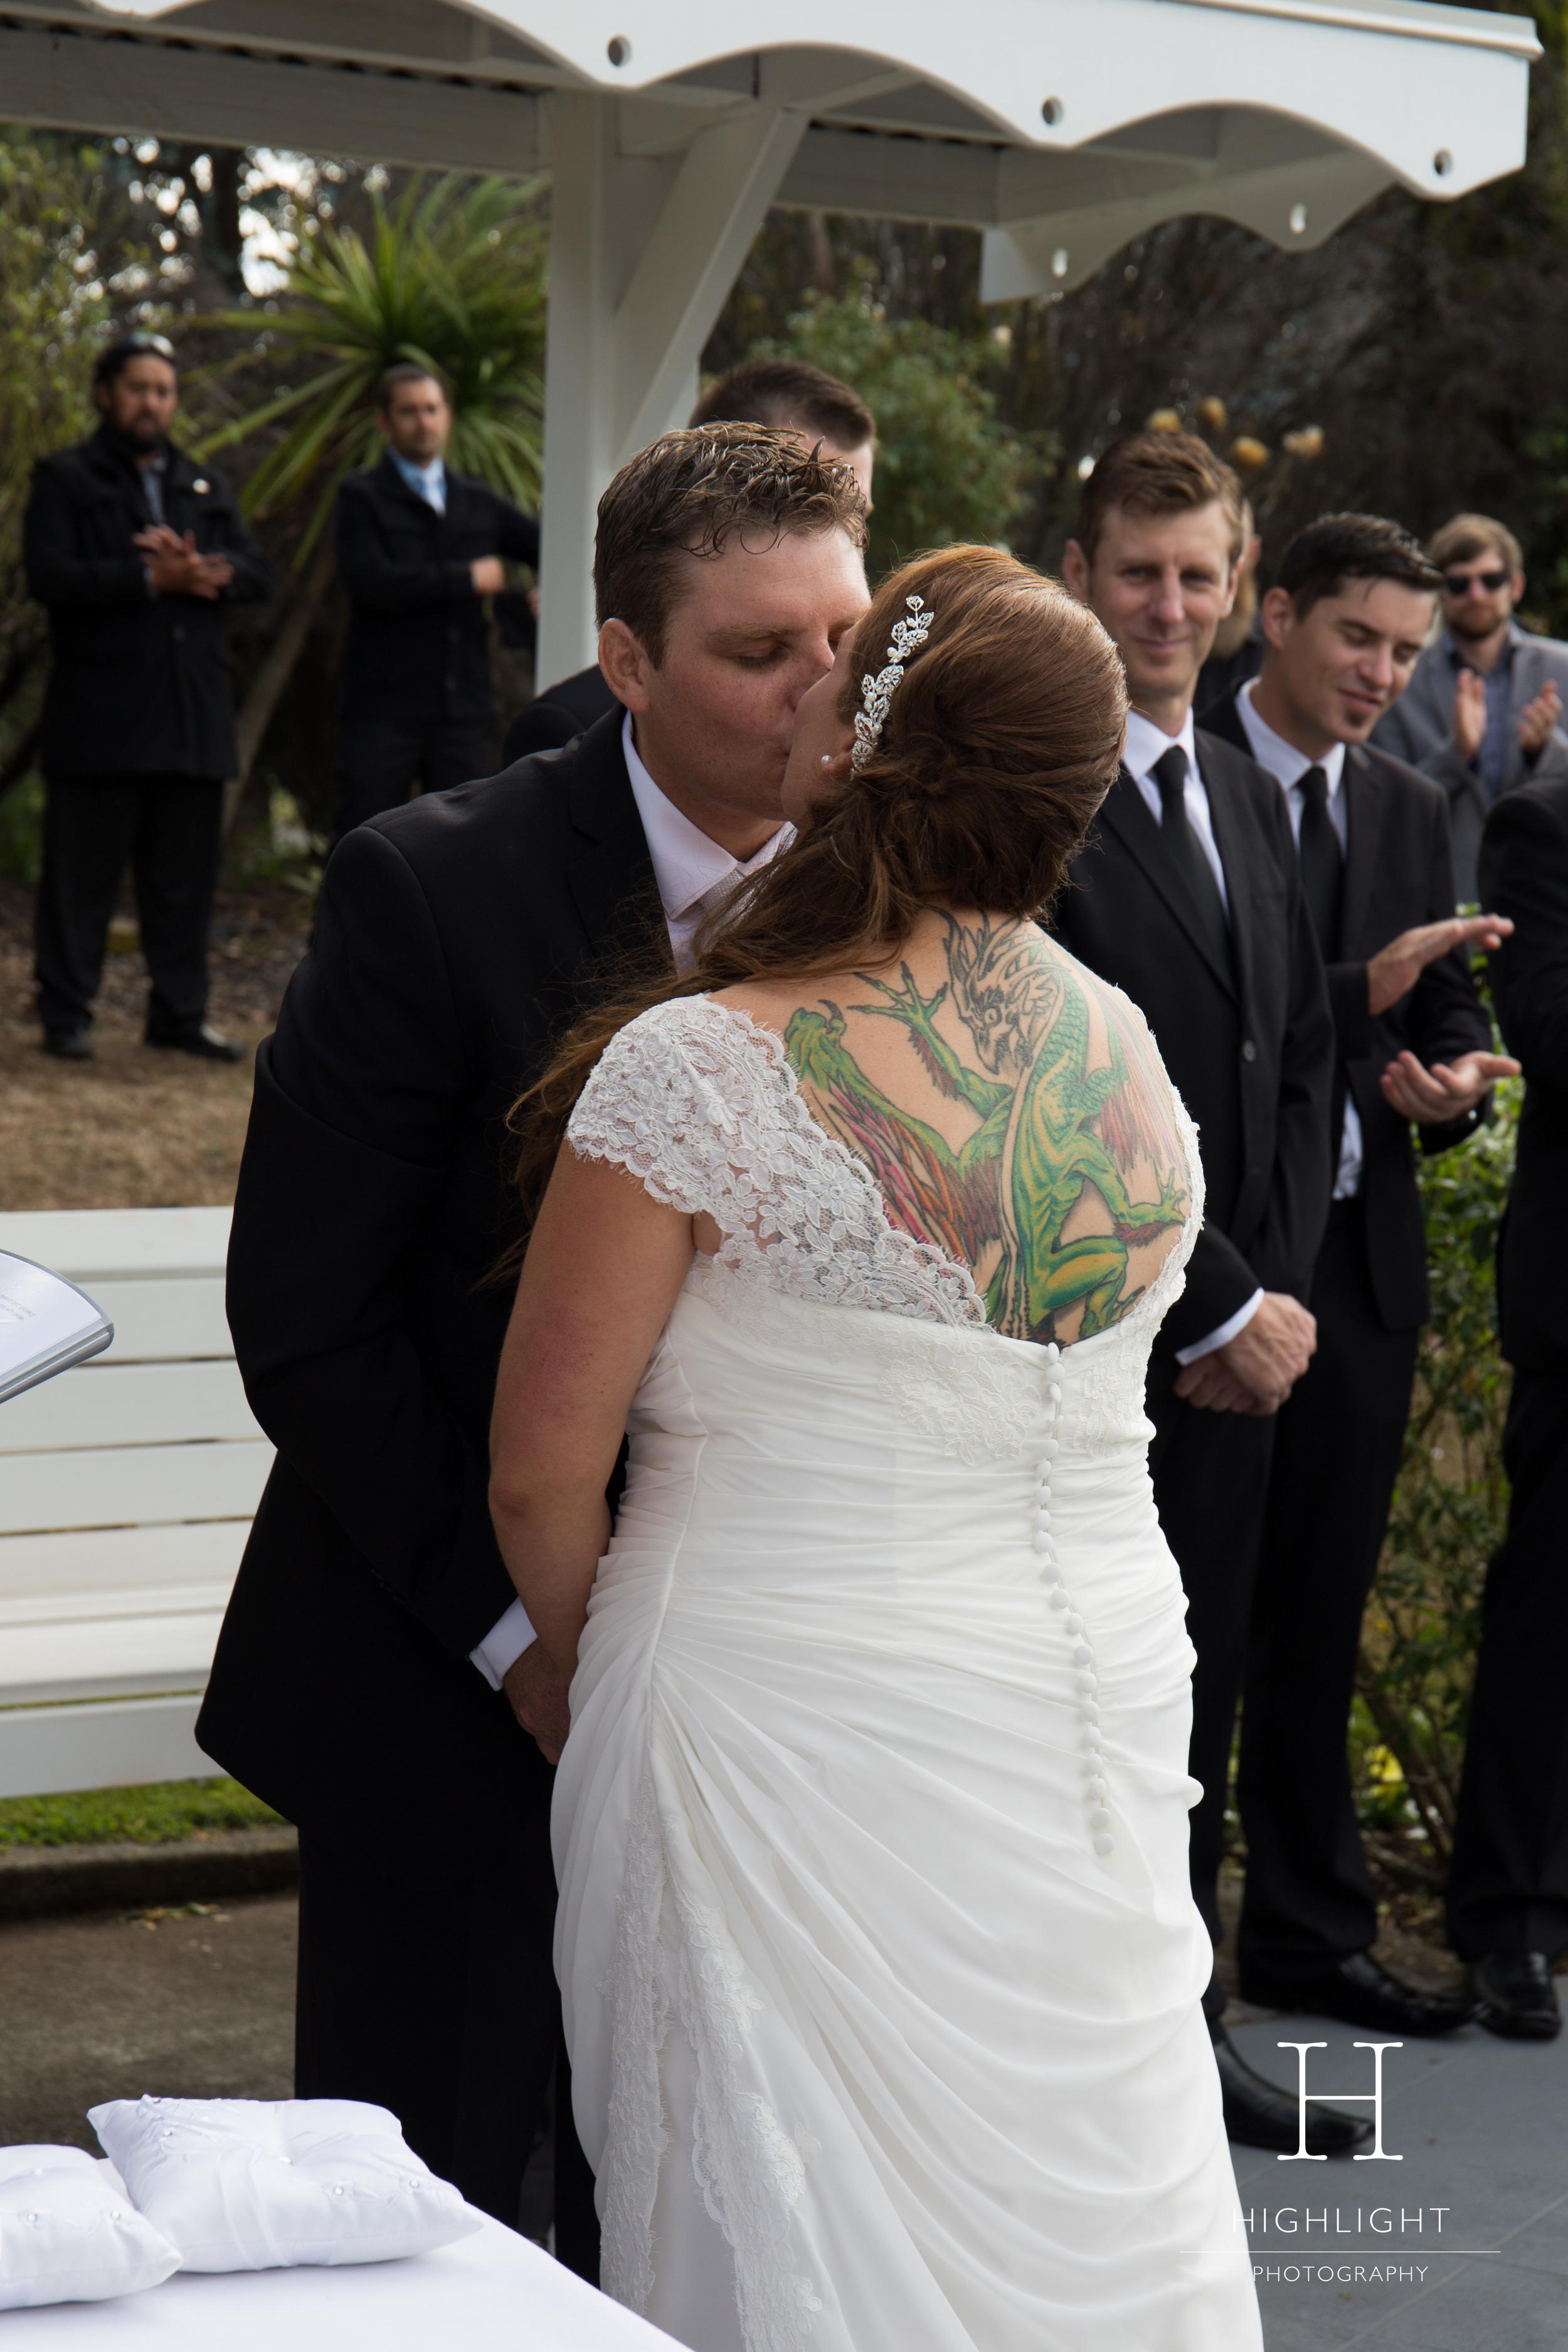 highlight-photography-wedding-new-zealand.jpg